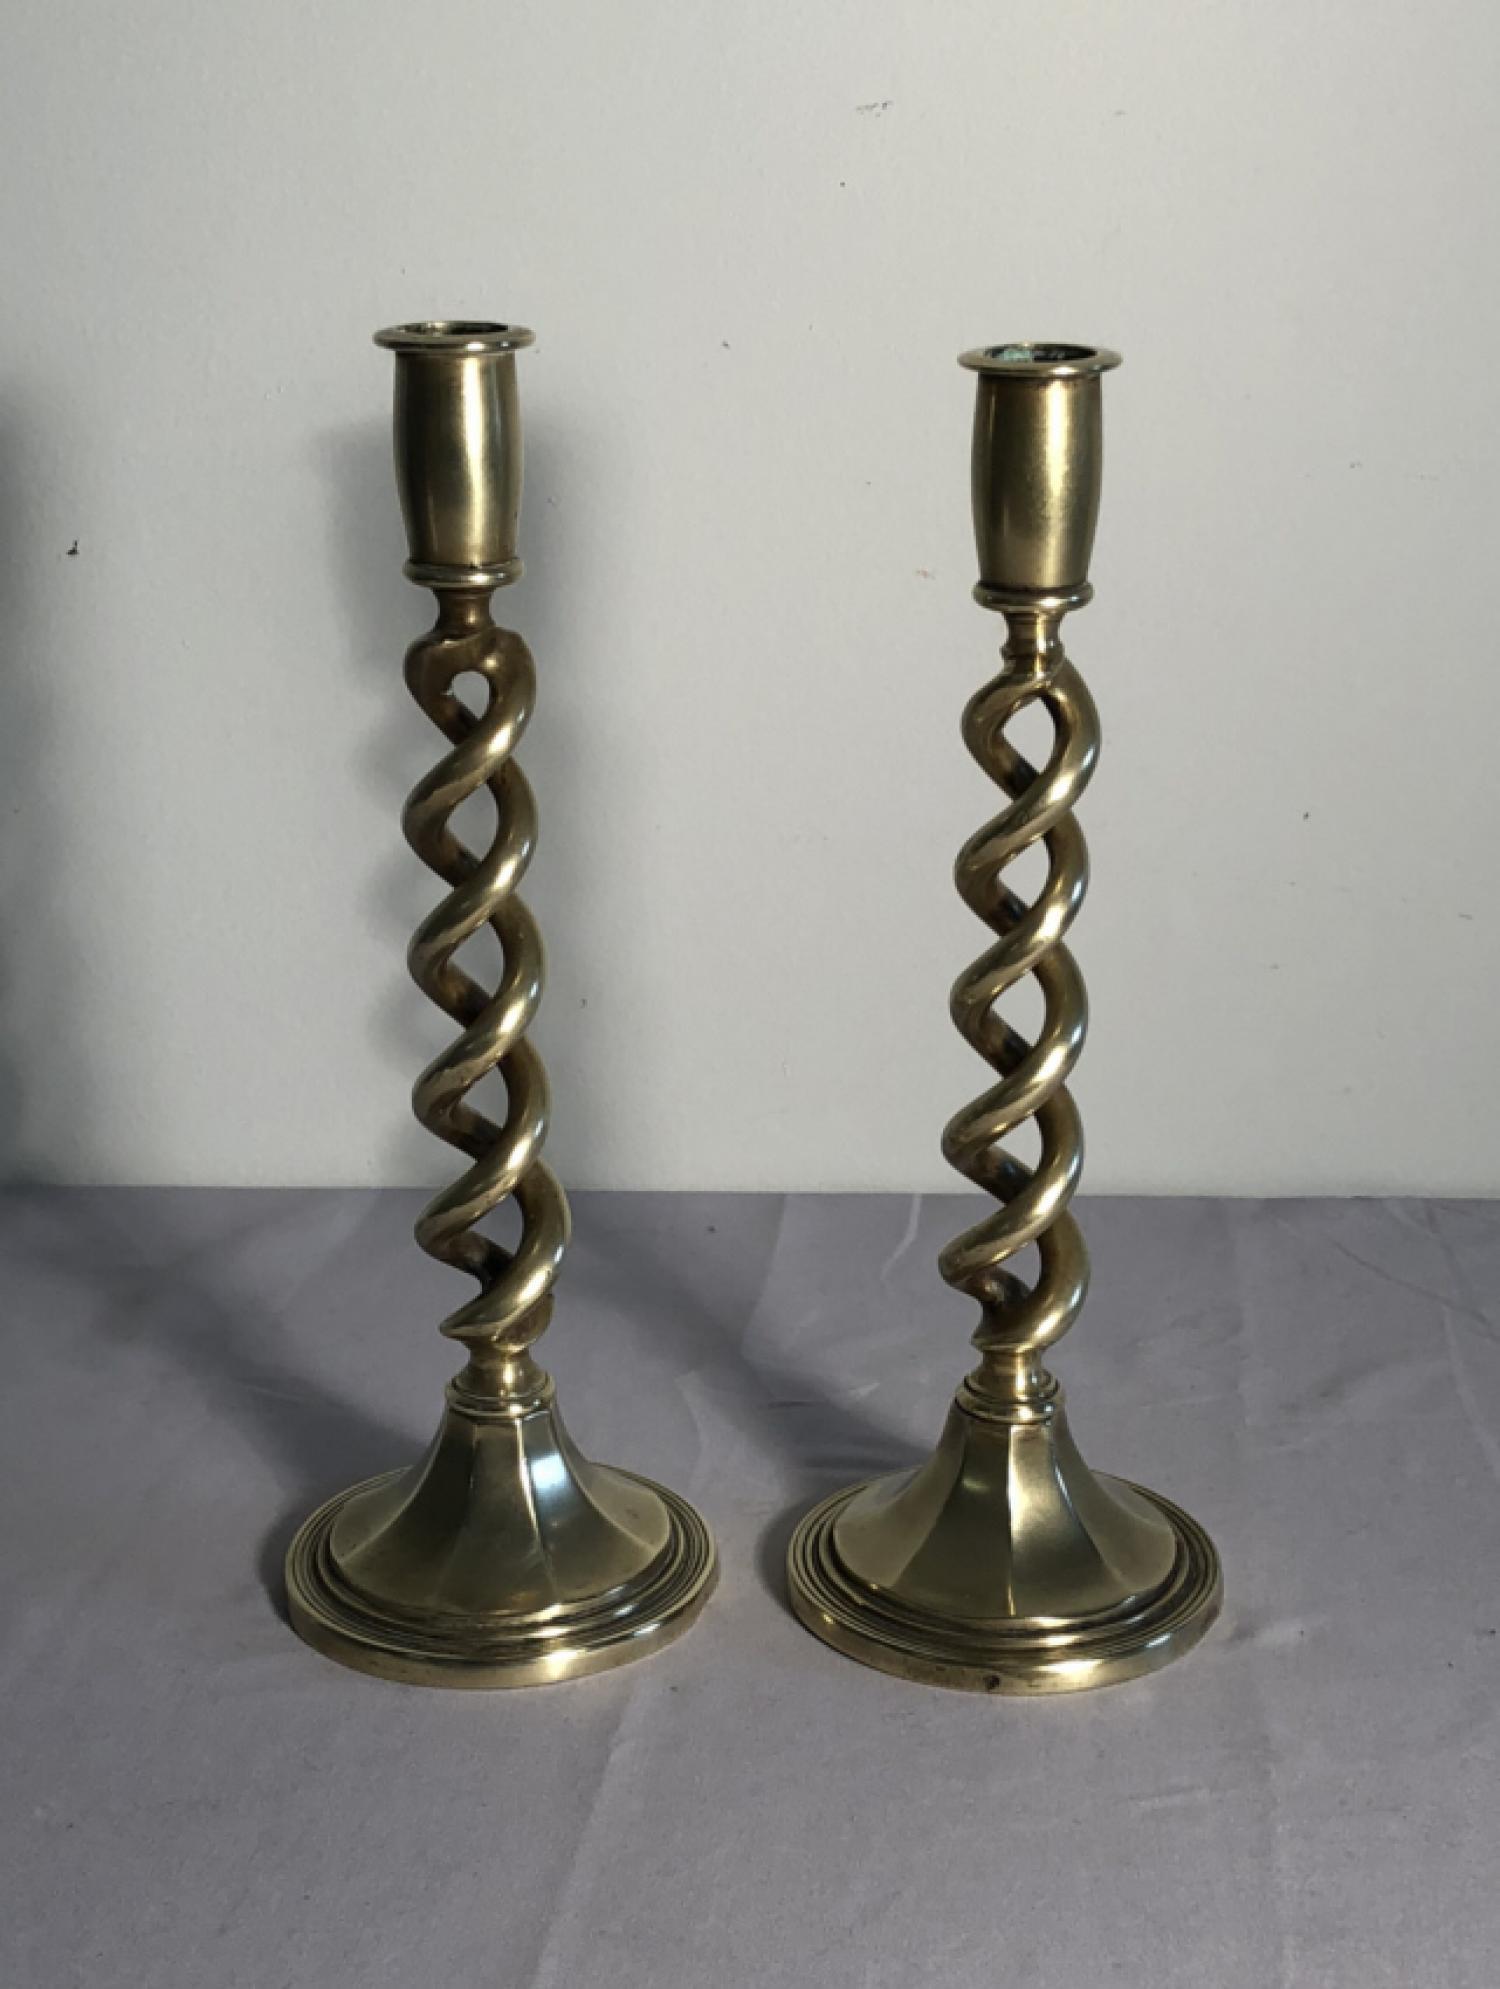 Antique English open twist brass candlesticks c1840-60